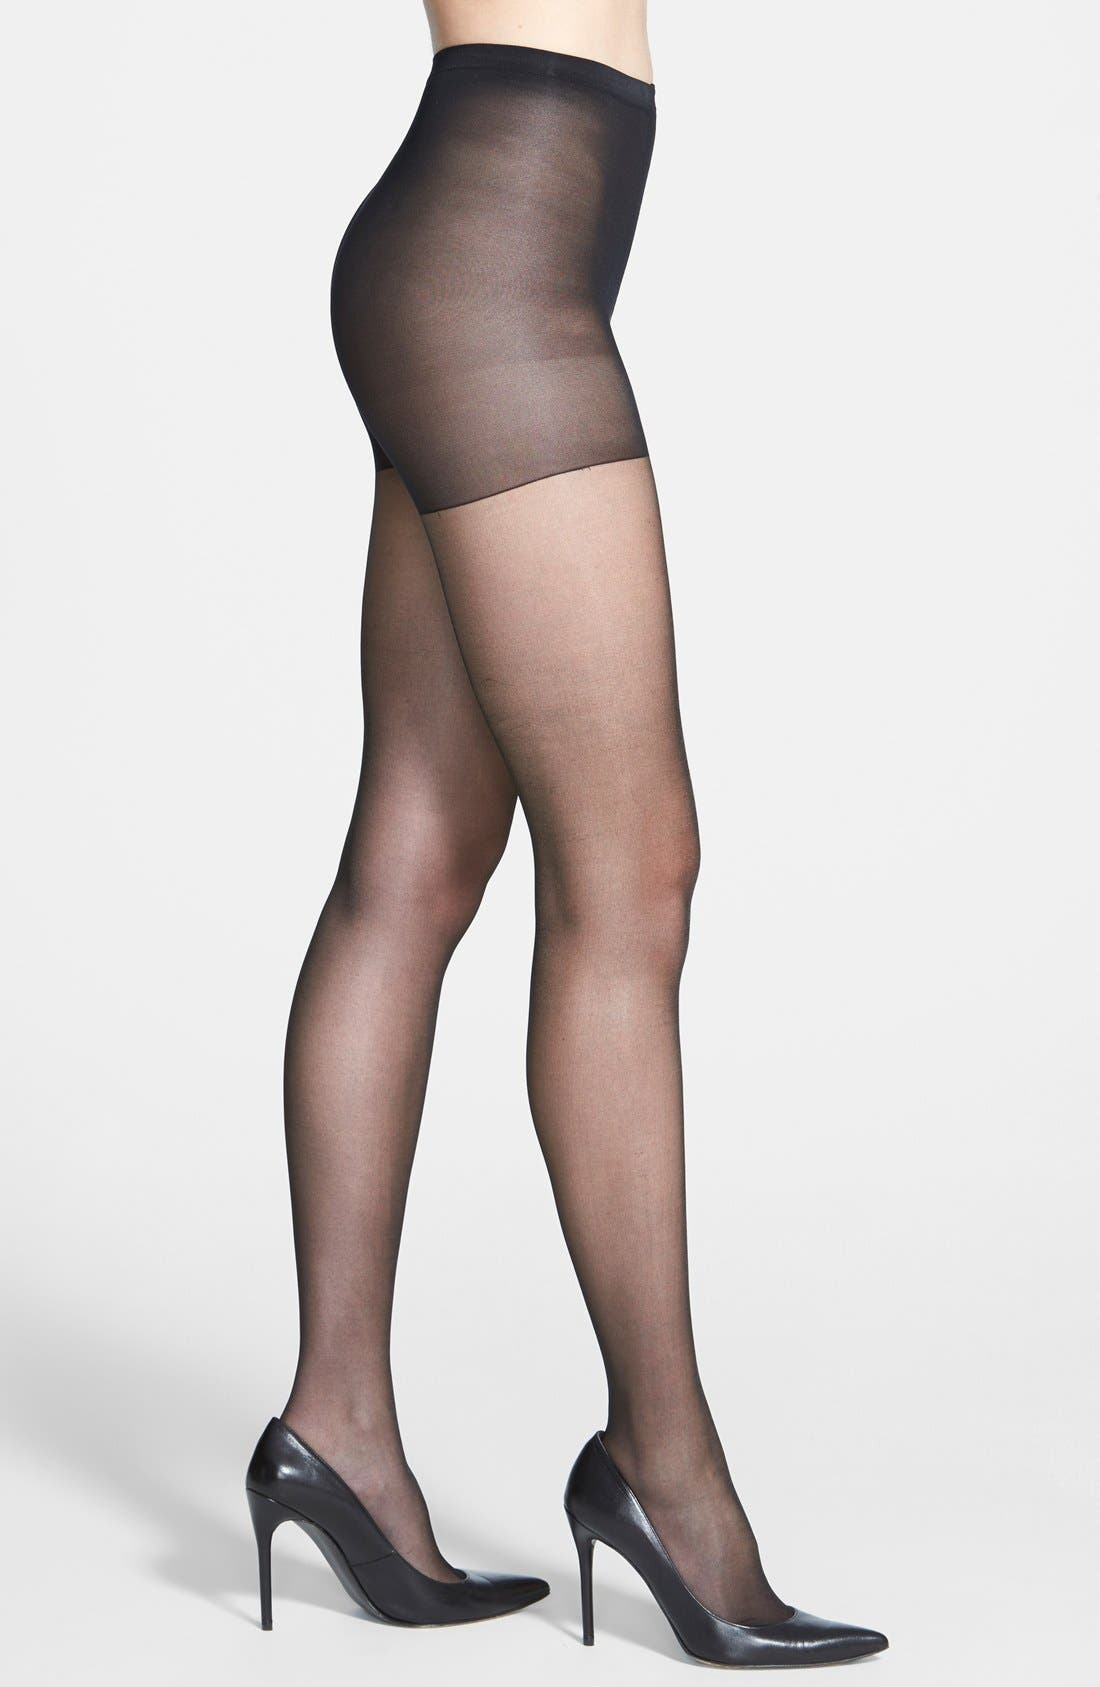 Alternate Image 1 Selected - Calvin Klein Shimmer Sheer Control Top Pantyhose